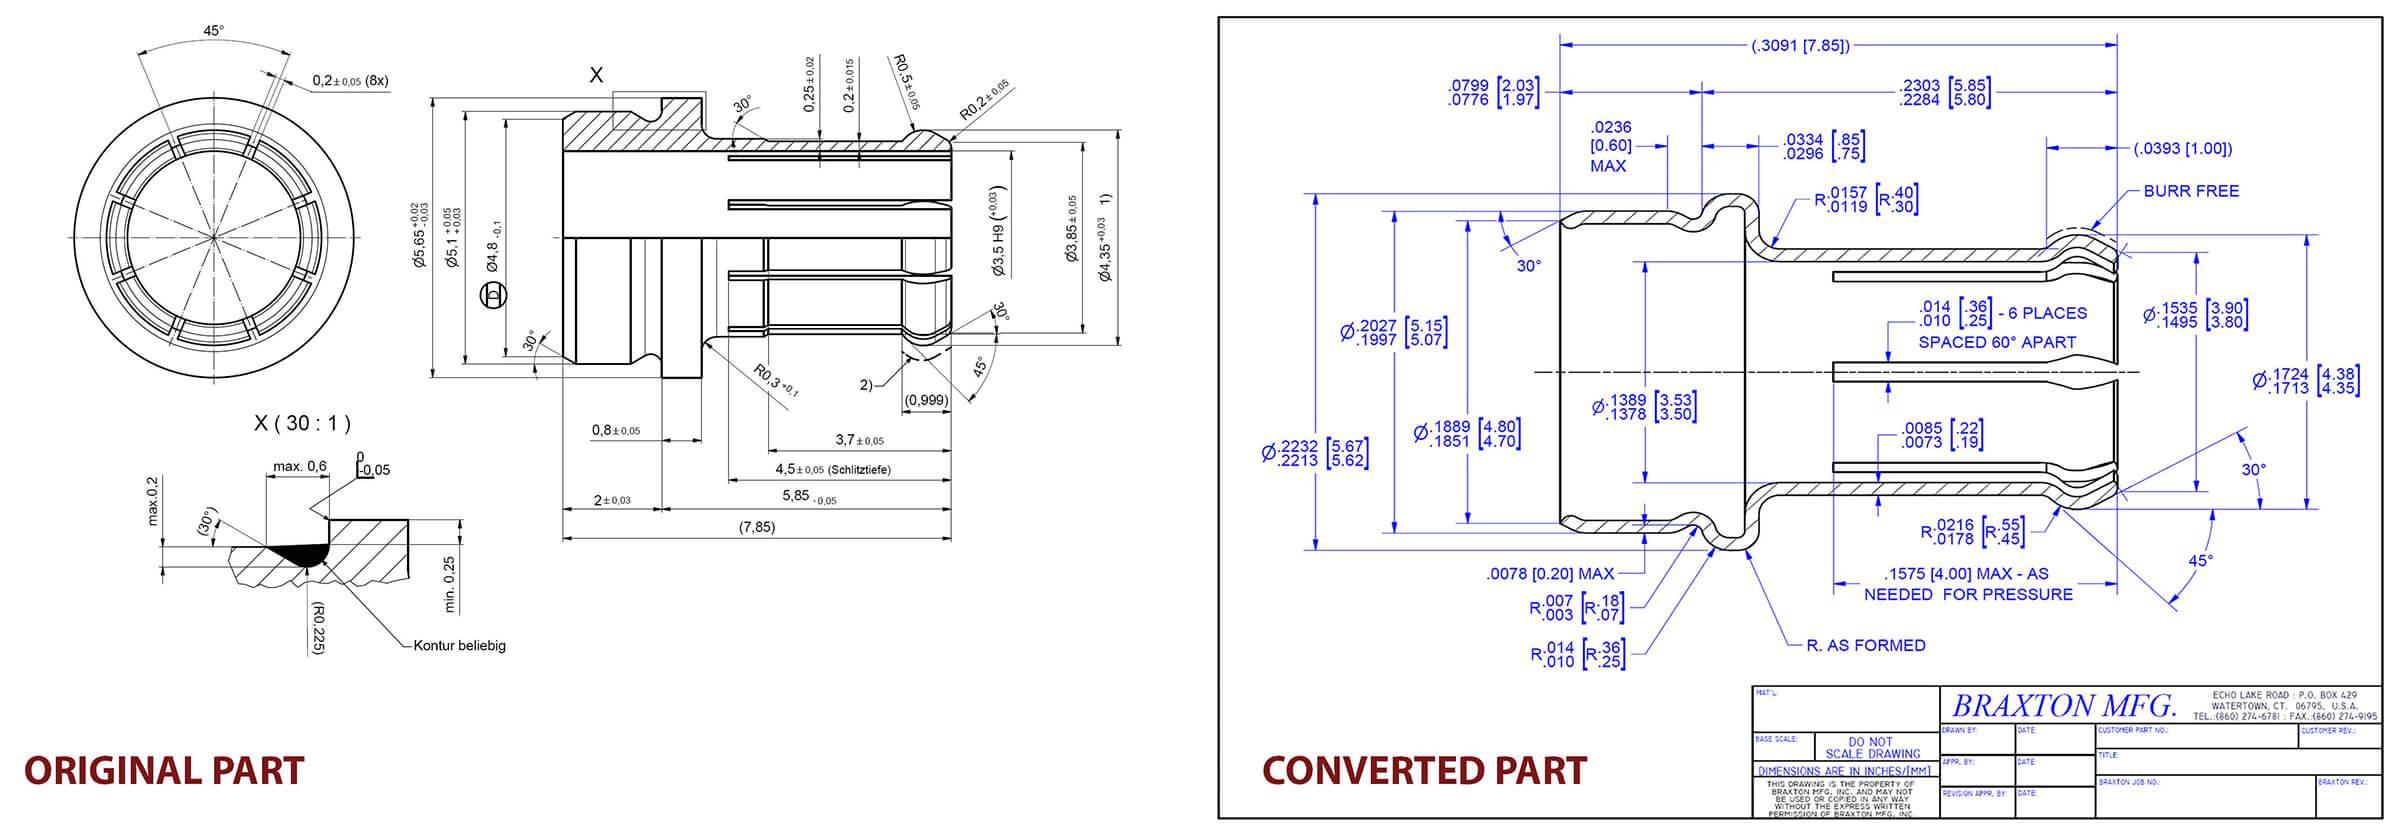 Deep draw conversion sample one